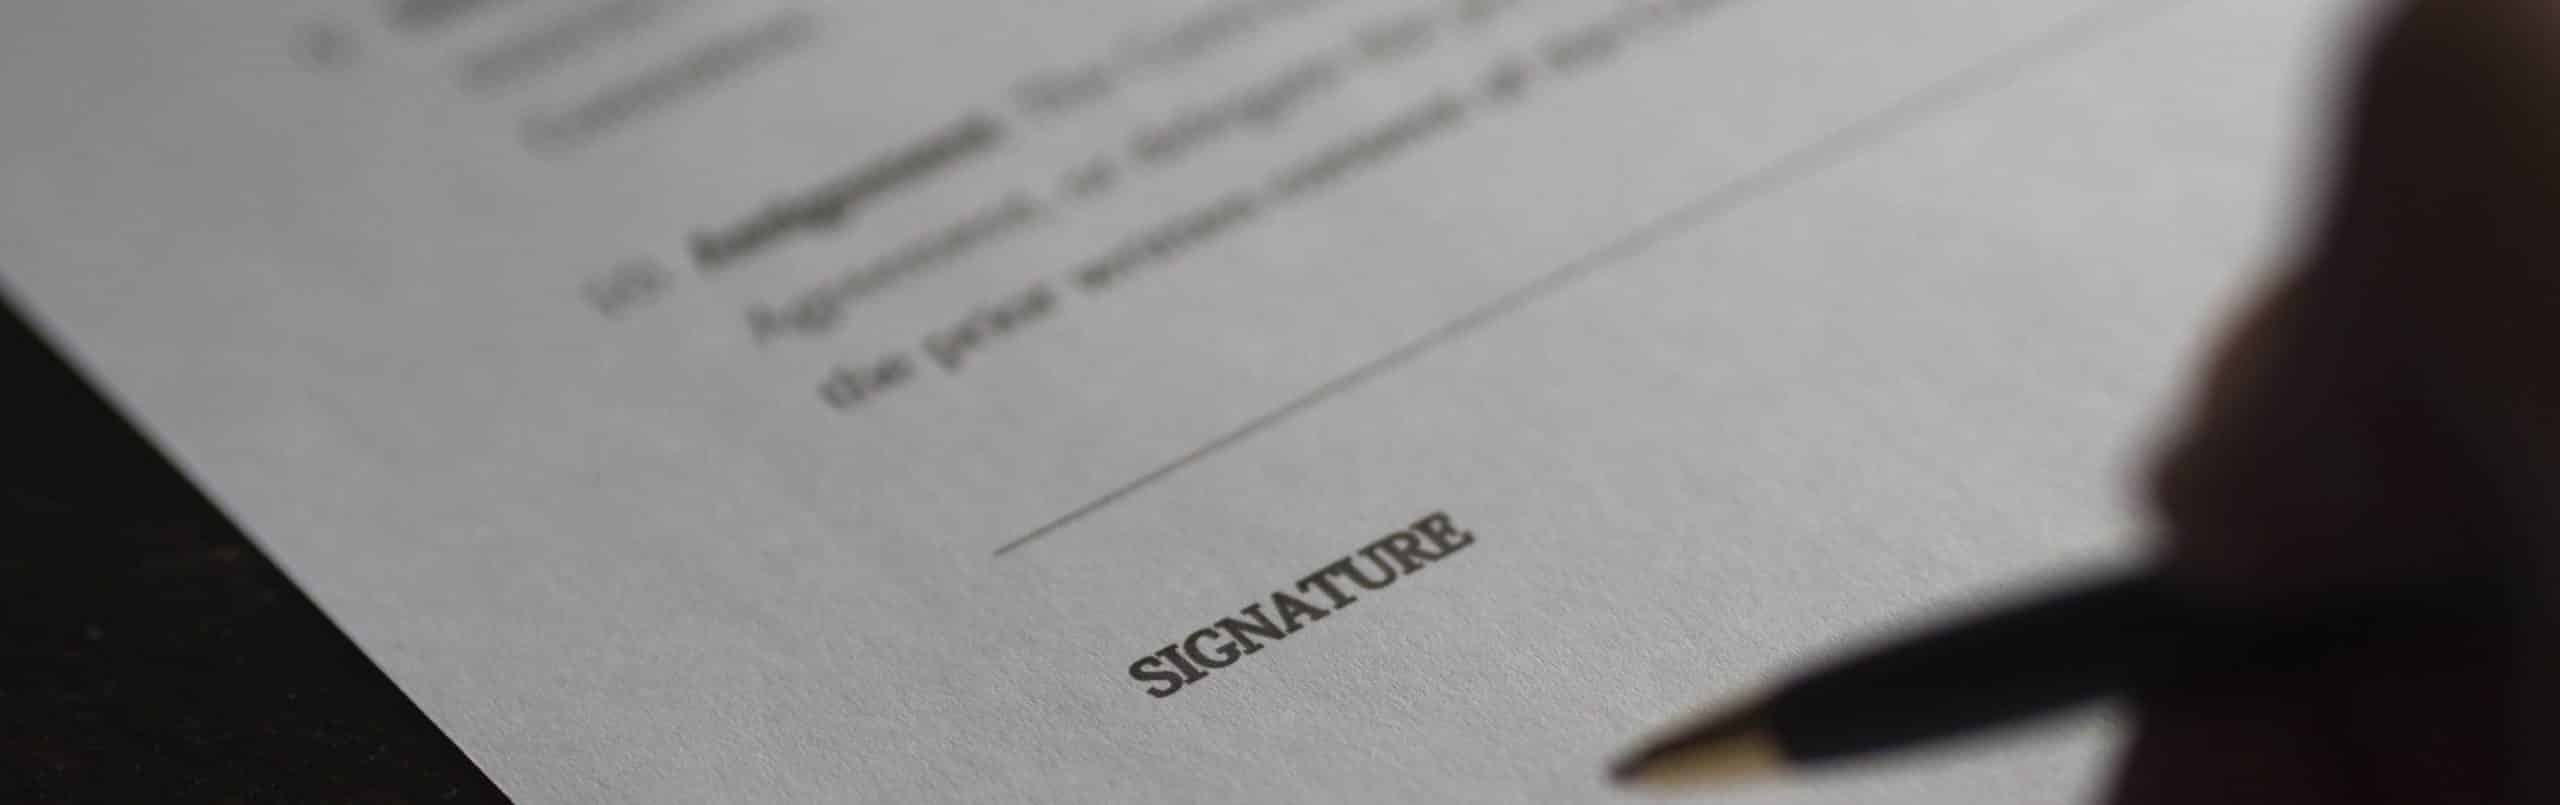 colorado debt collection license application